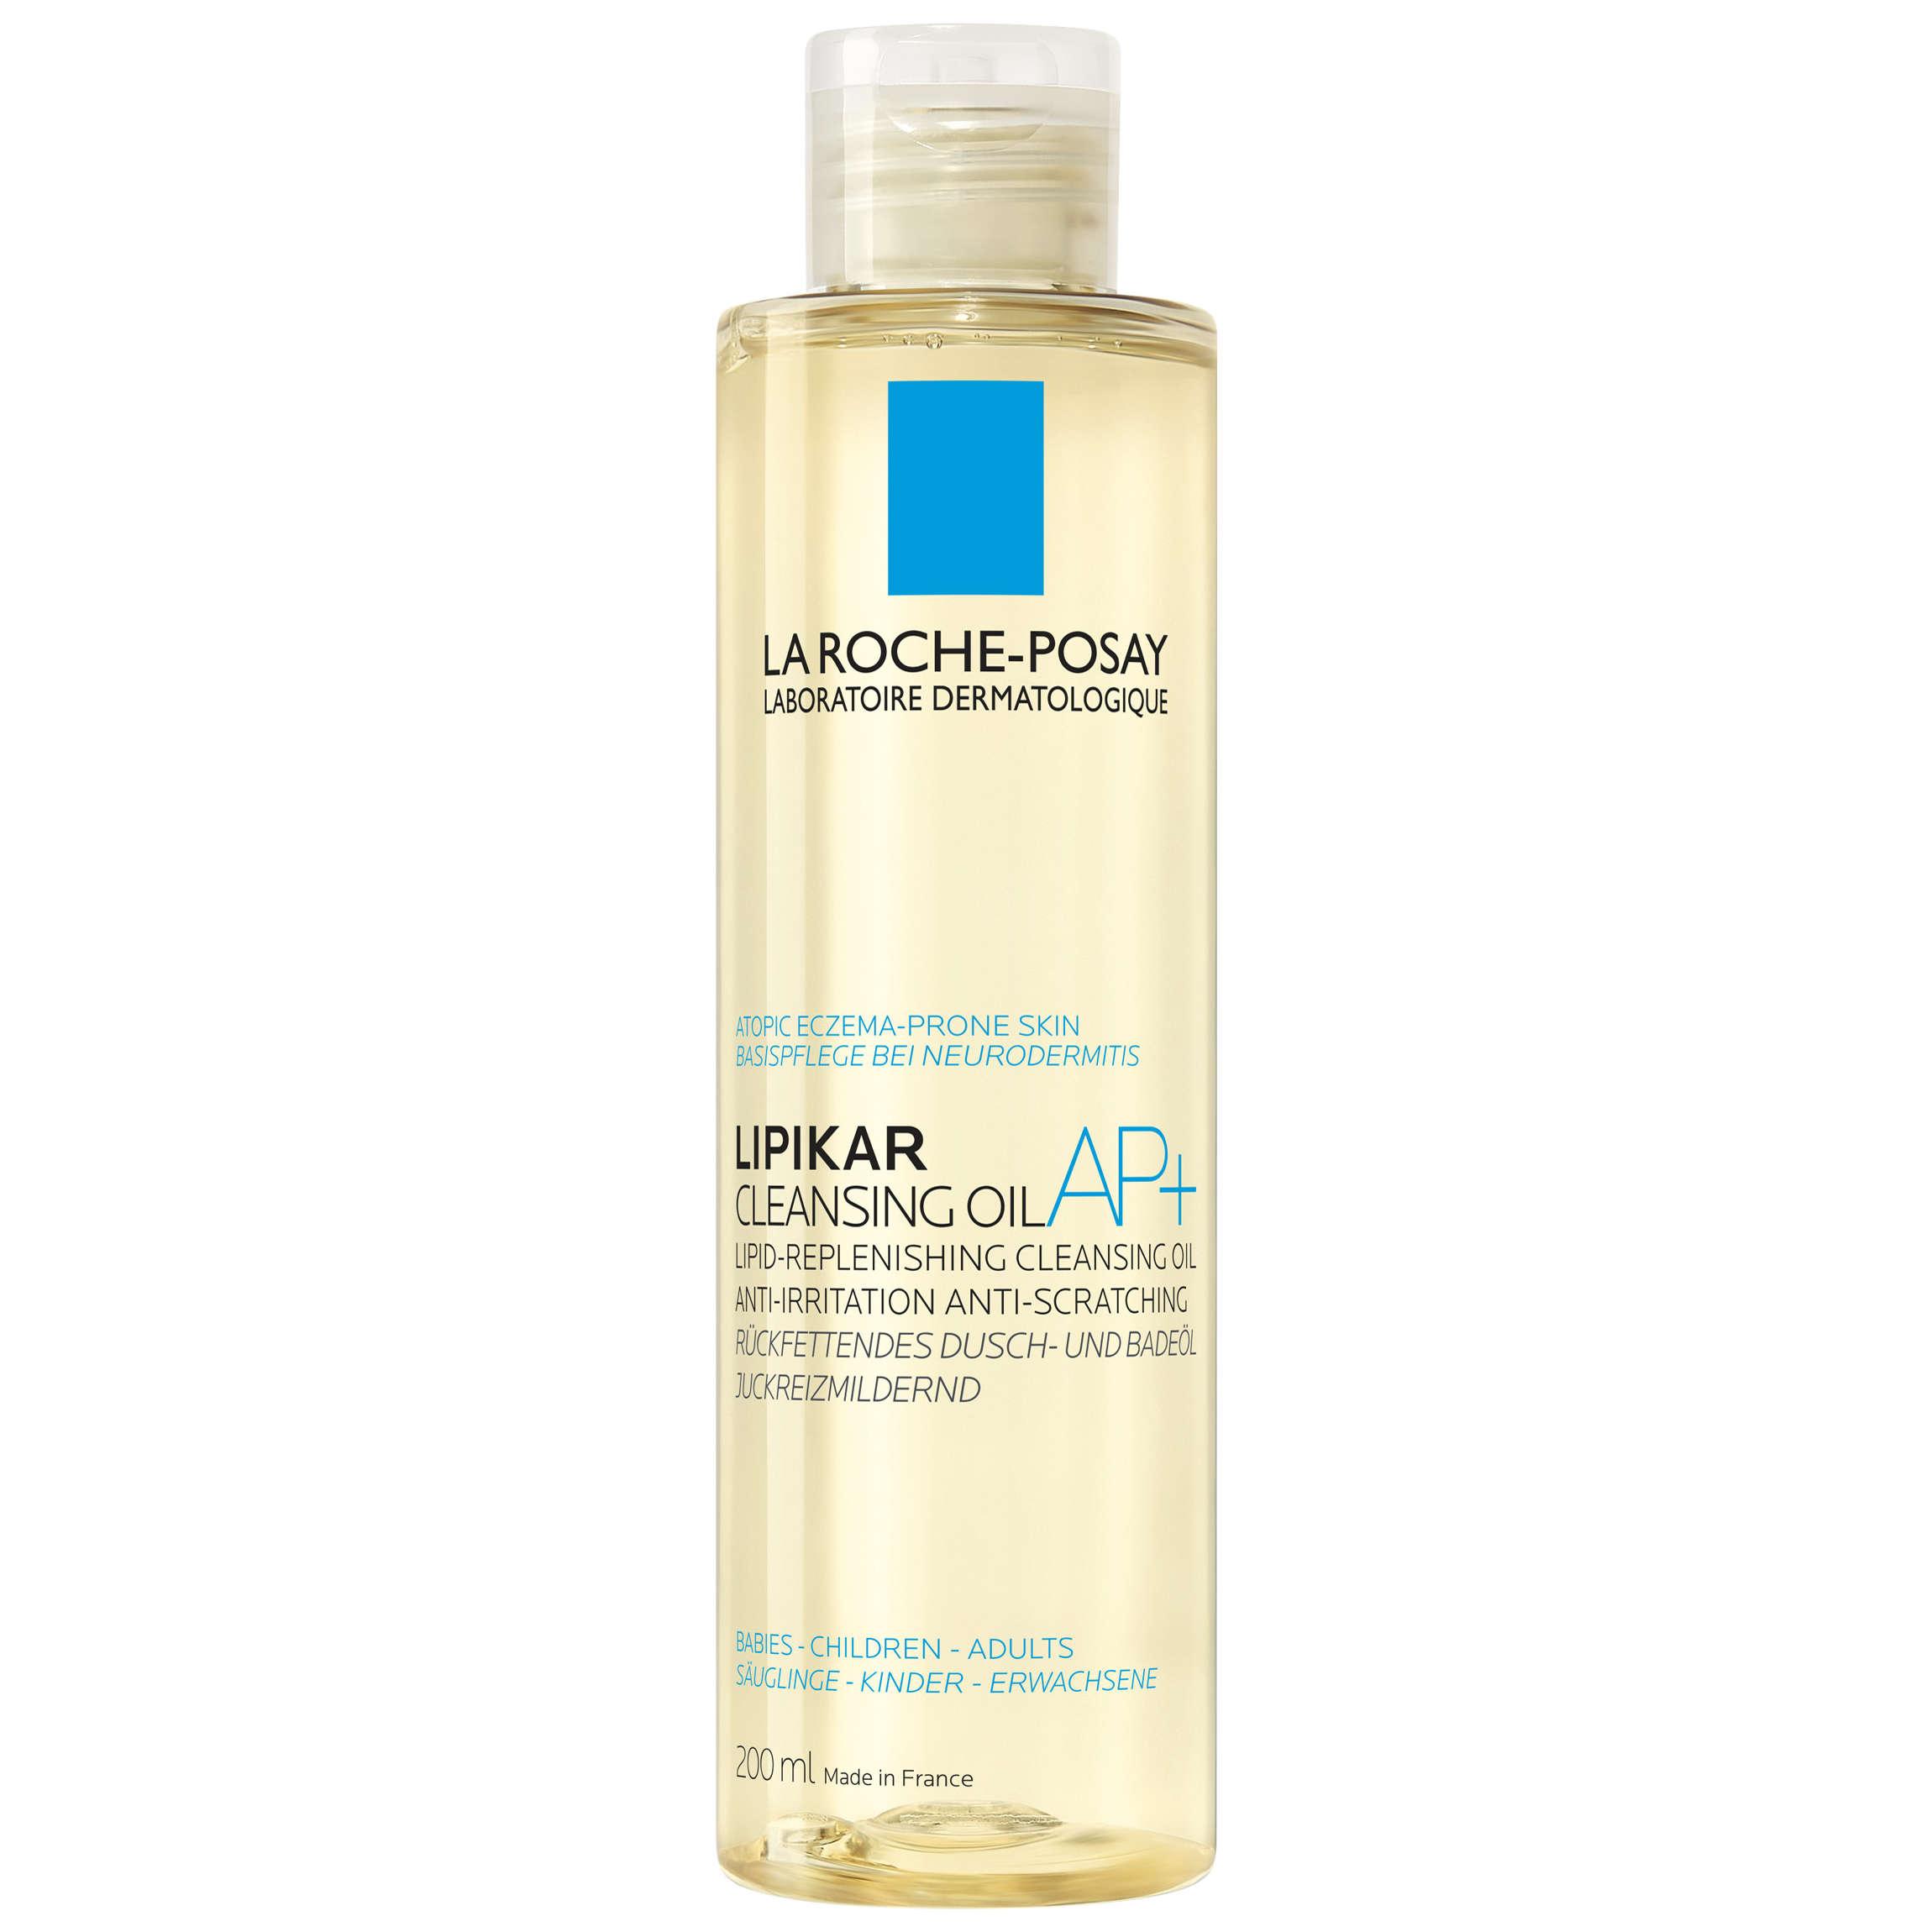 La Roche-posay - Lipikar - Olio detergente relipidante AP+